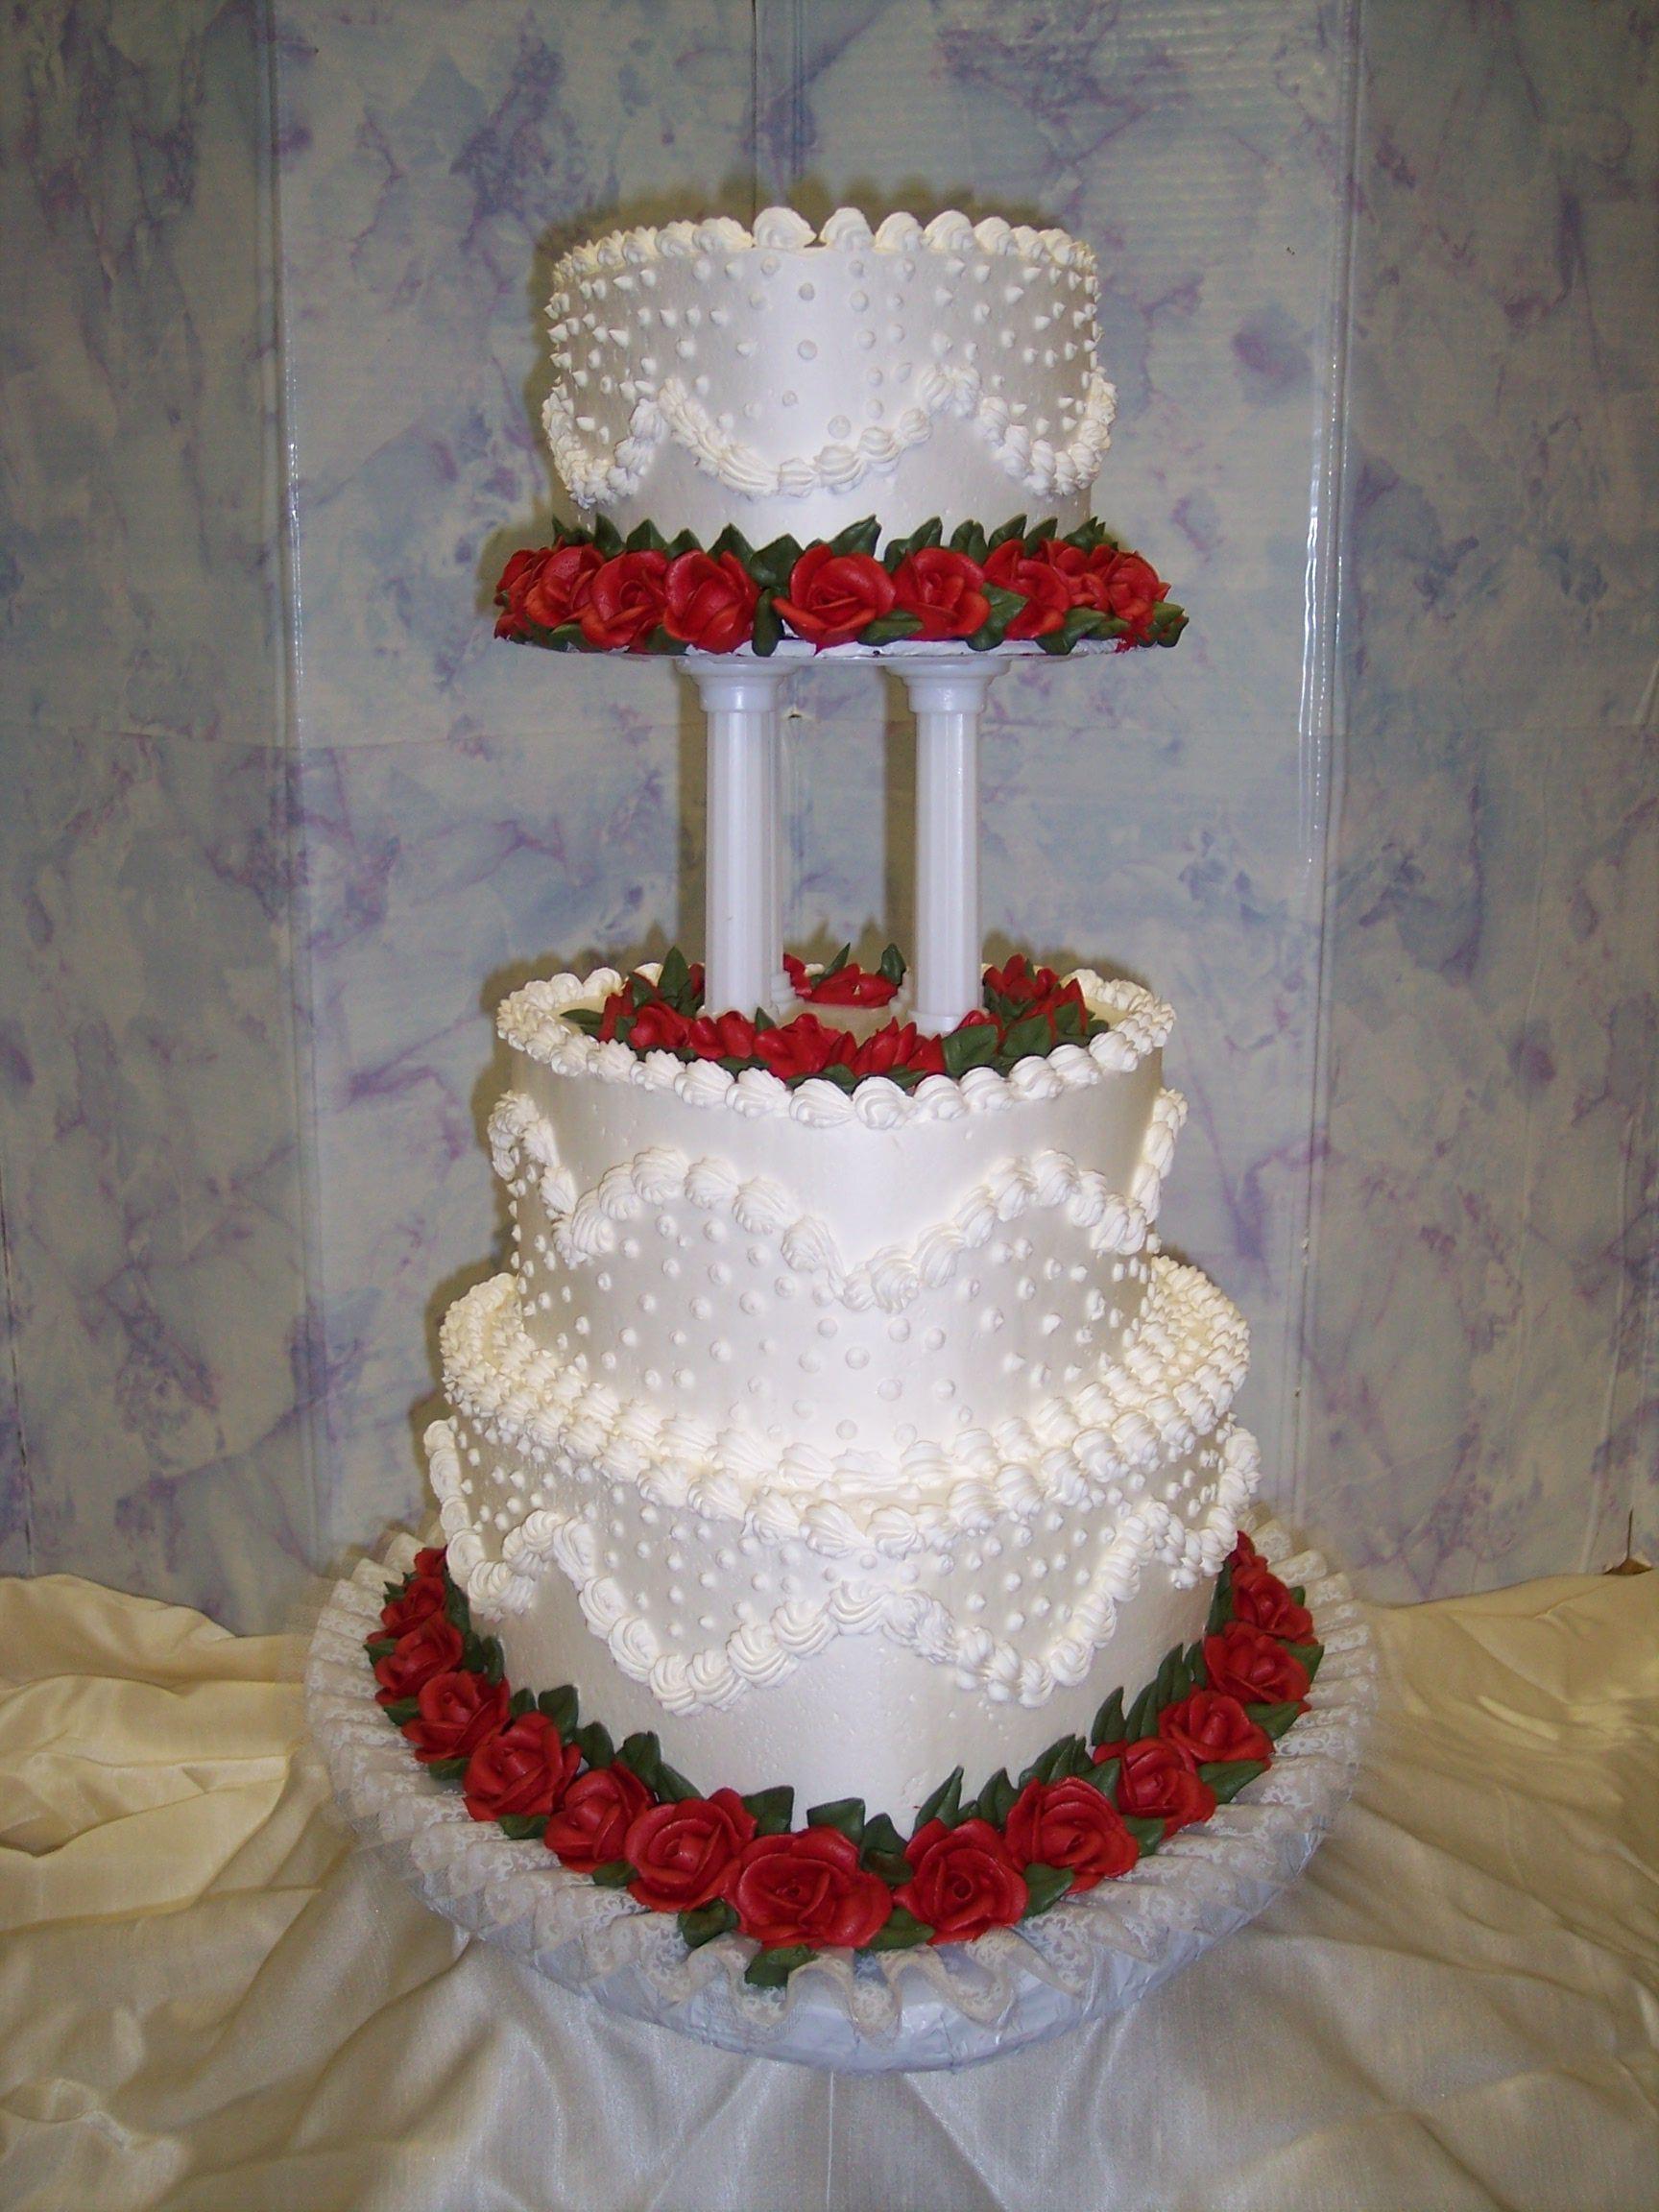 Wedding Cakes Ideas Pictures  wedding cakes